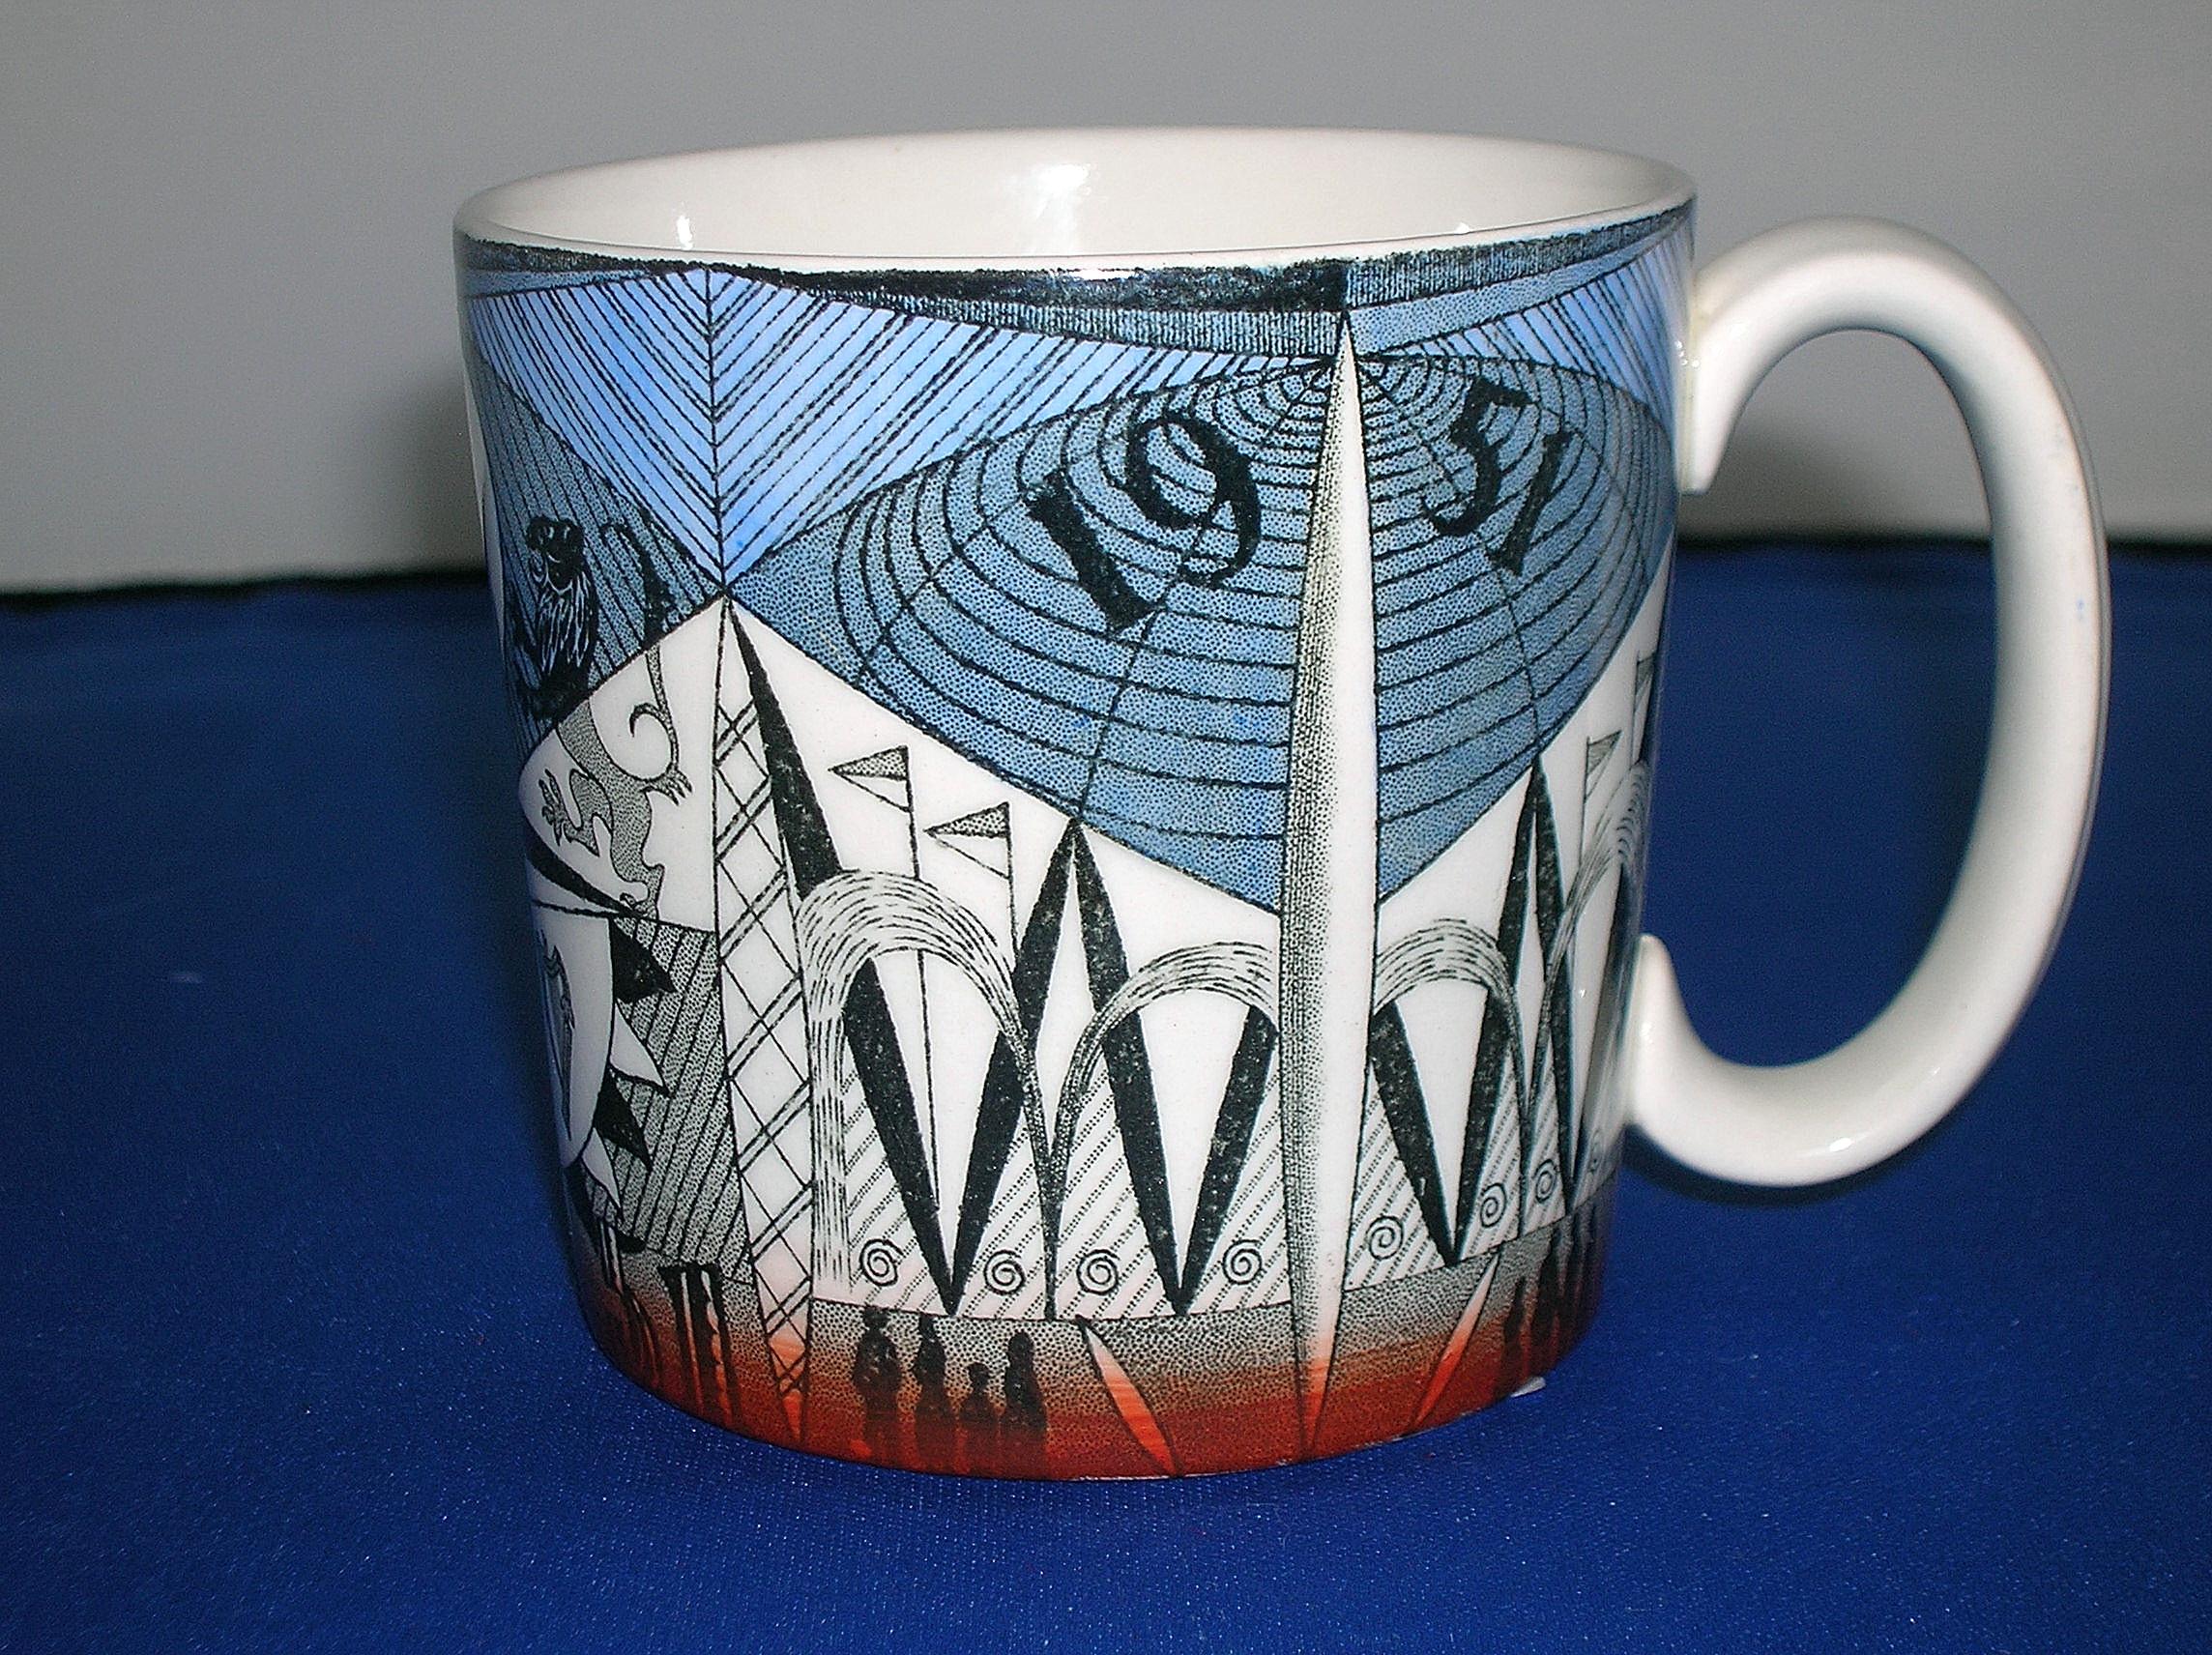 1951 Wedgwood Festival of Britain Mug.